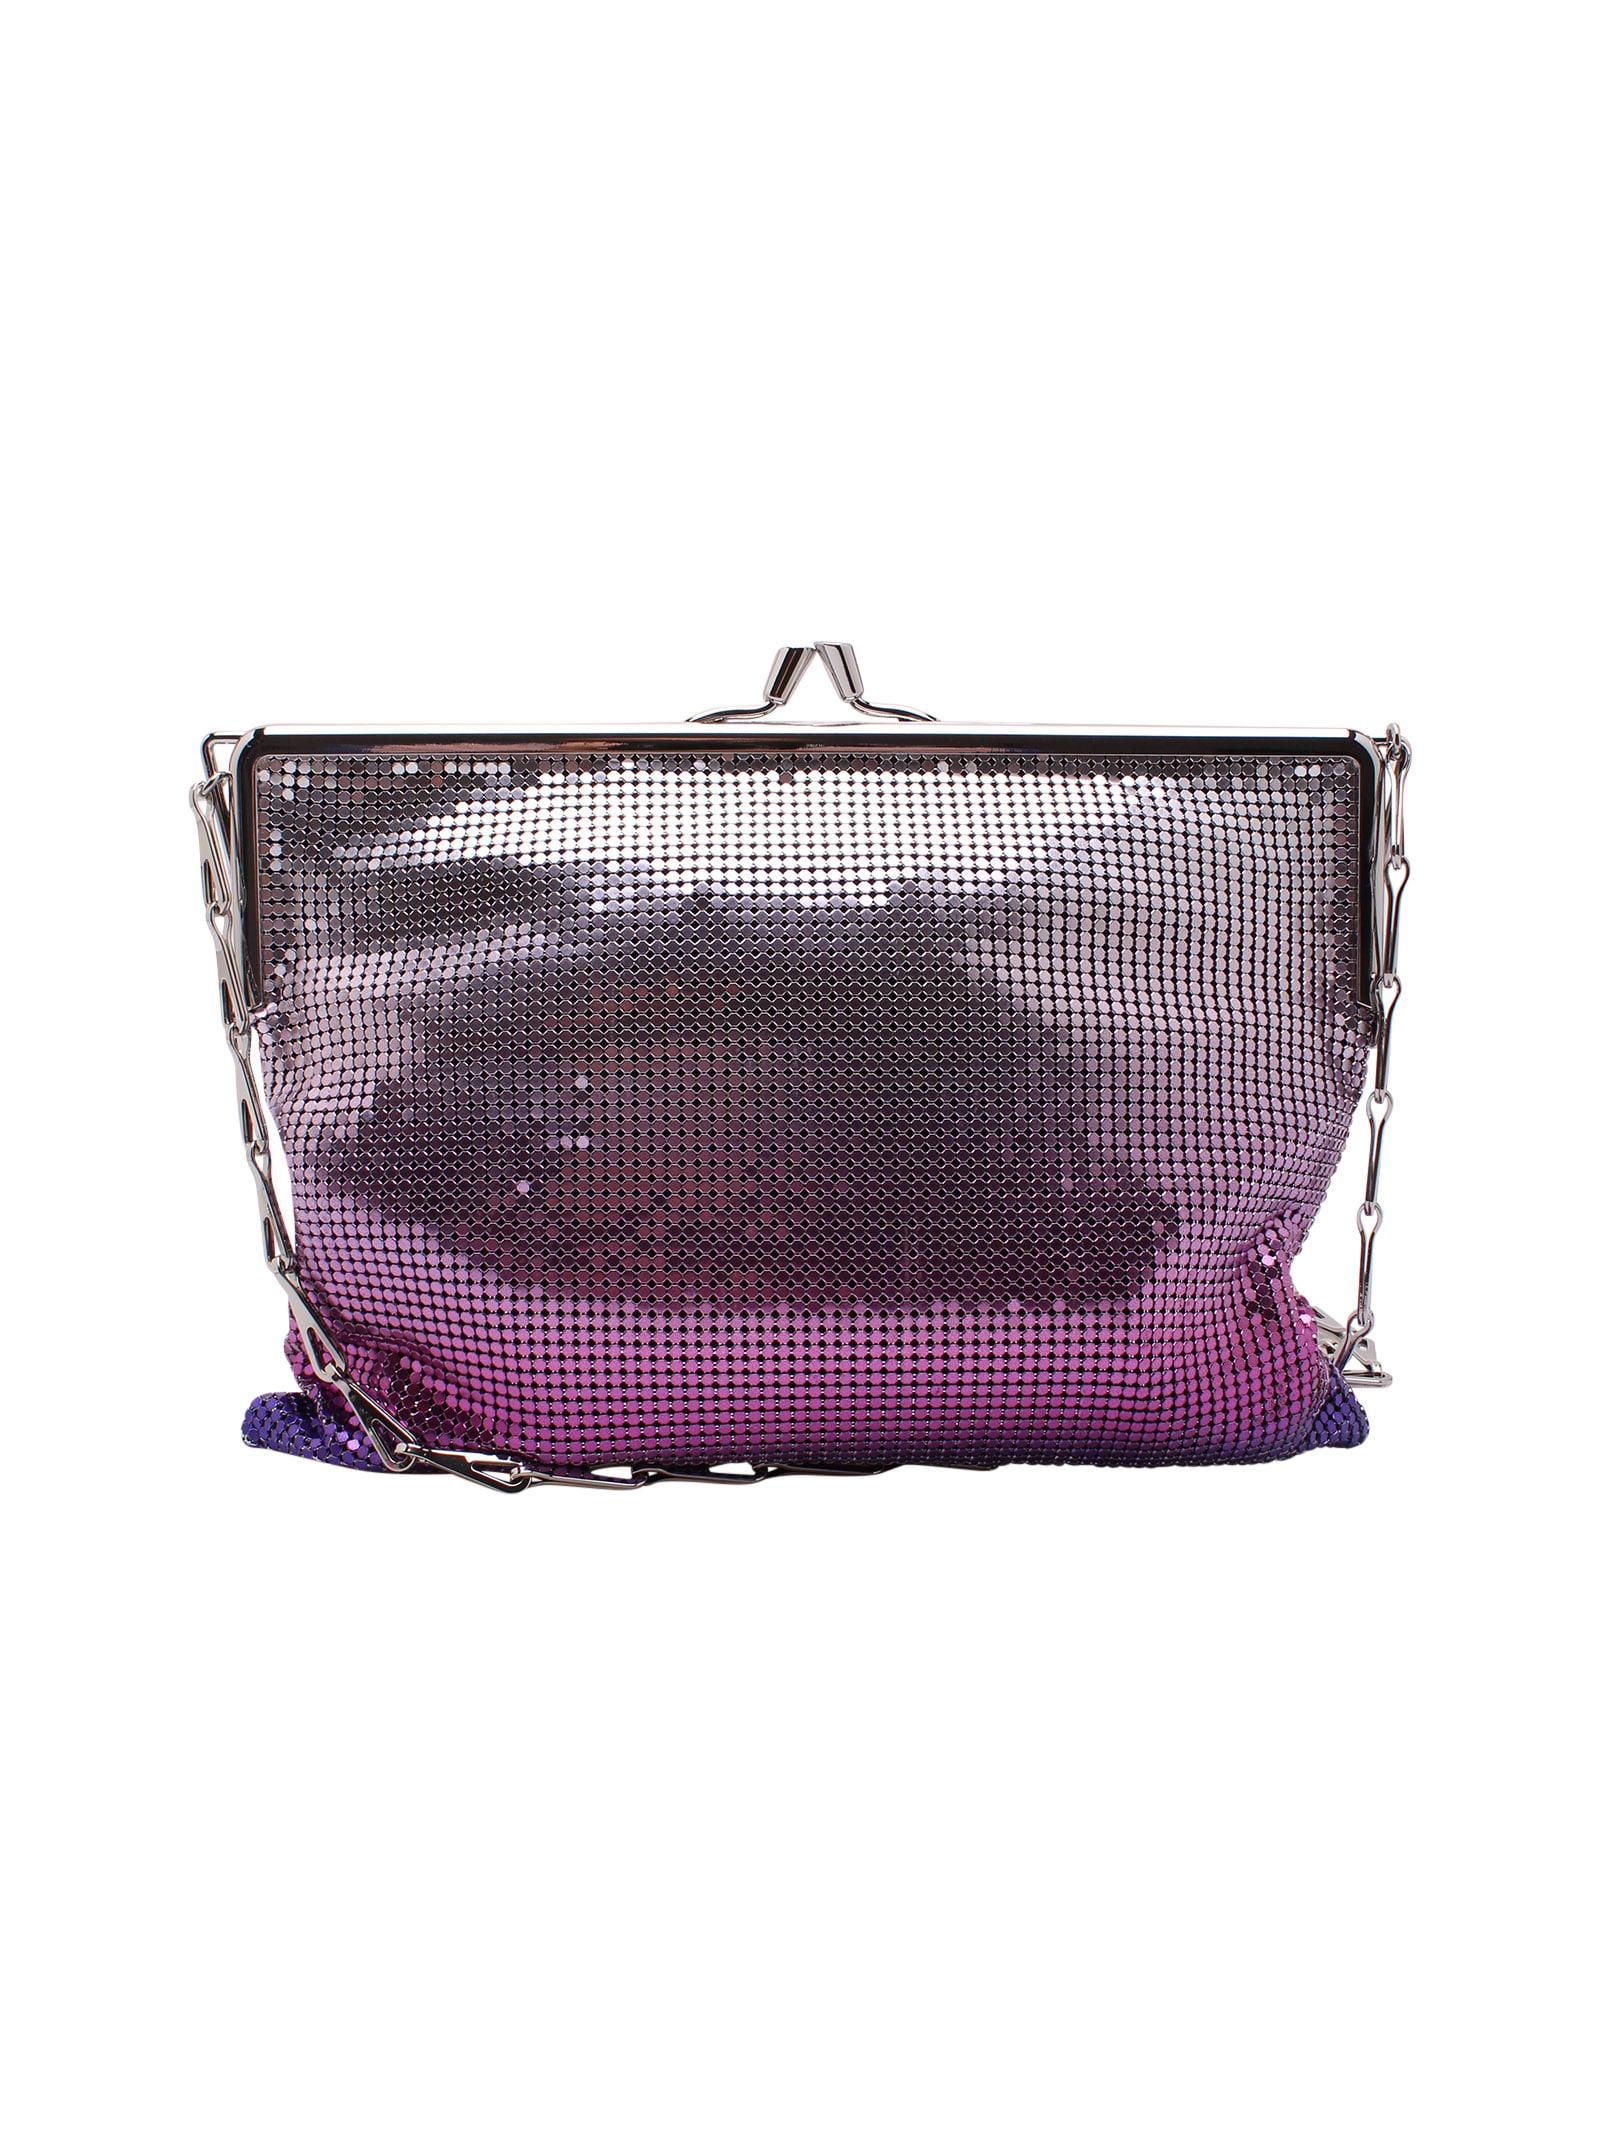 Paco Rabanne Pixel Ii Metallic Shoulder Bags In Purple Silver